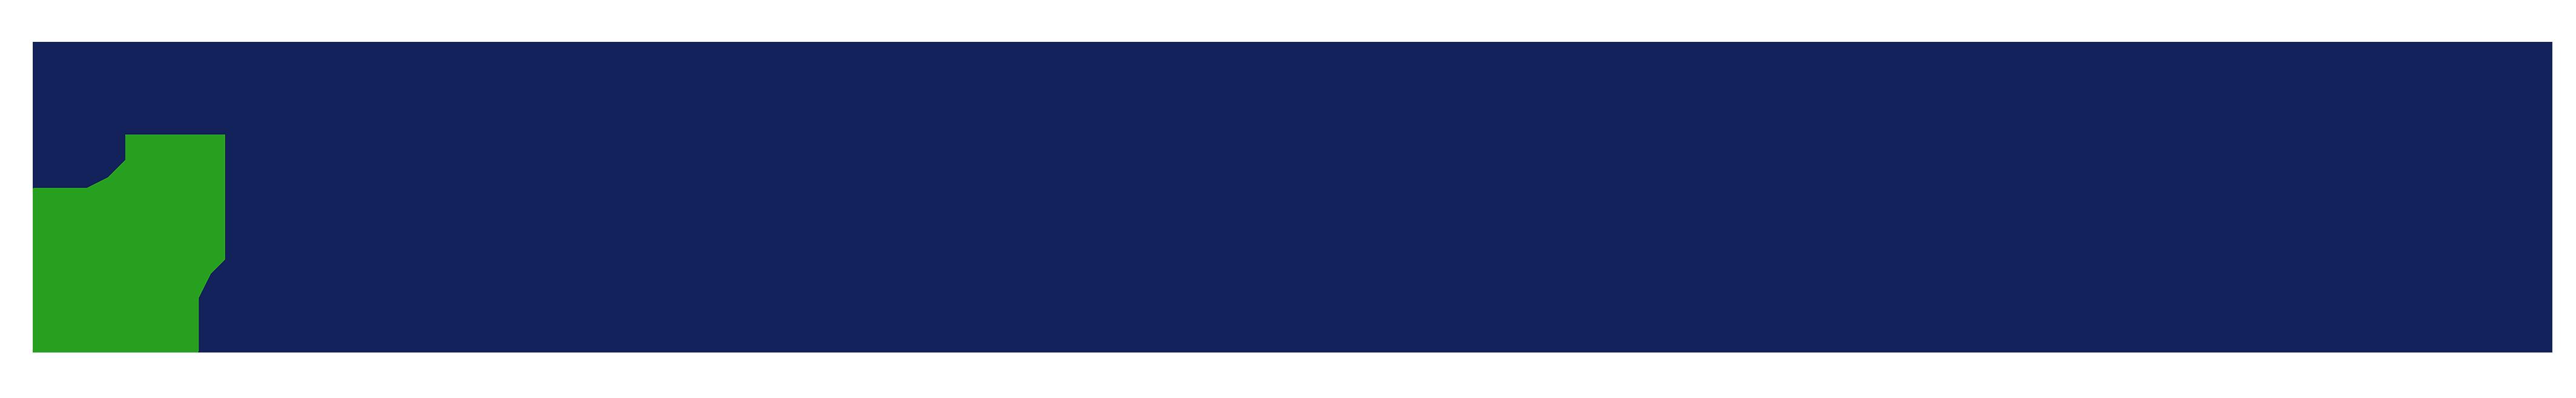 Definiti logo